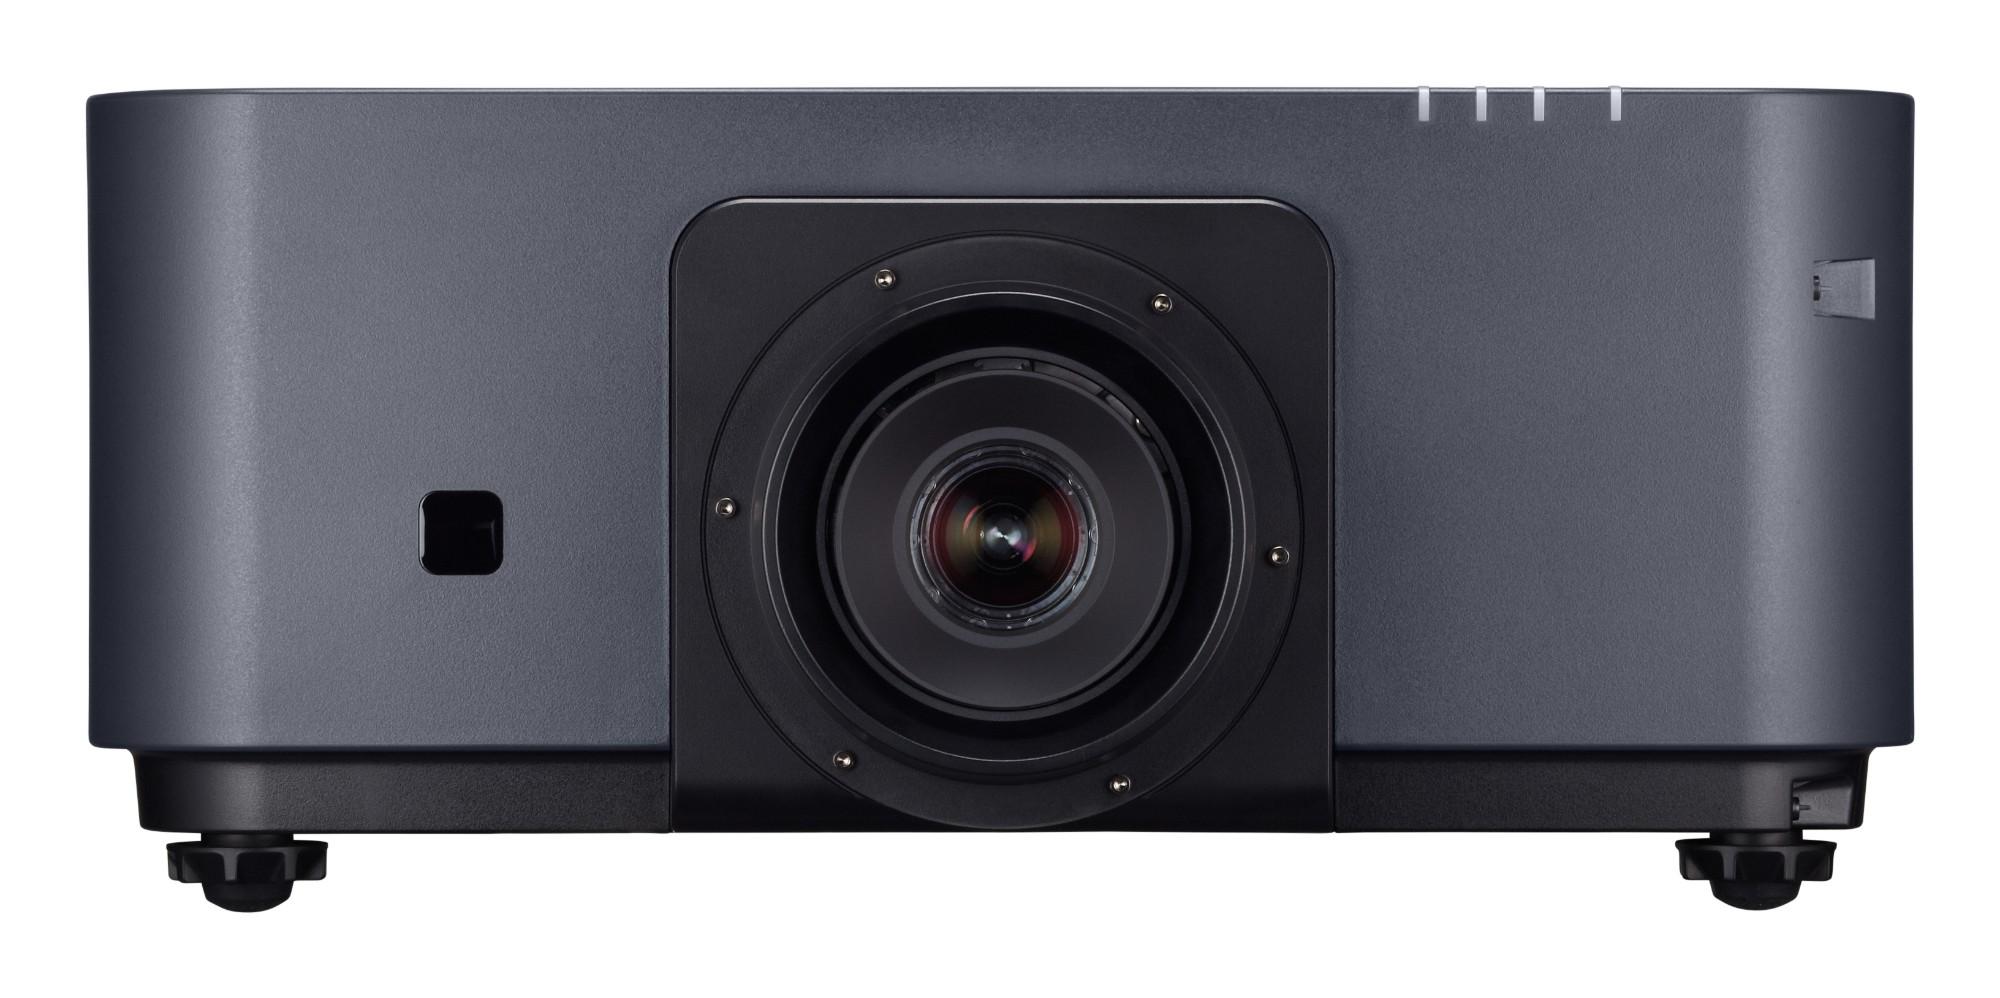 NEC PX602UL 6000ANSI lumens DLP WUXGA (1920x1200) 3D Desktop projector Black